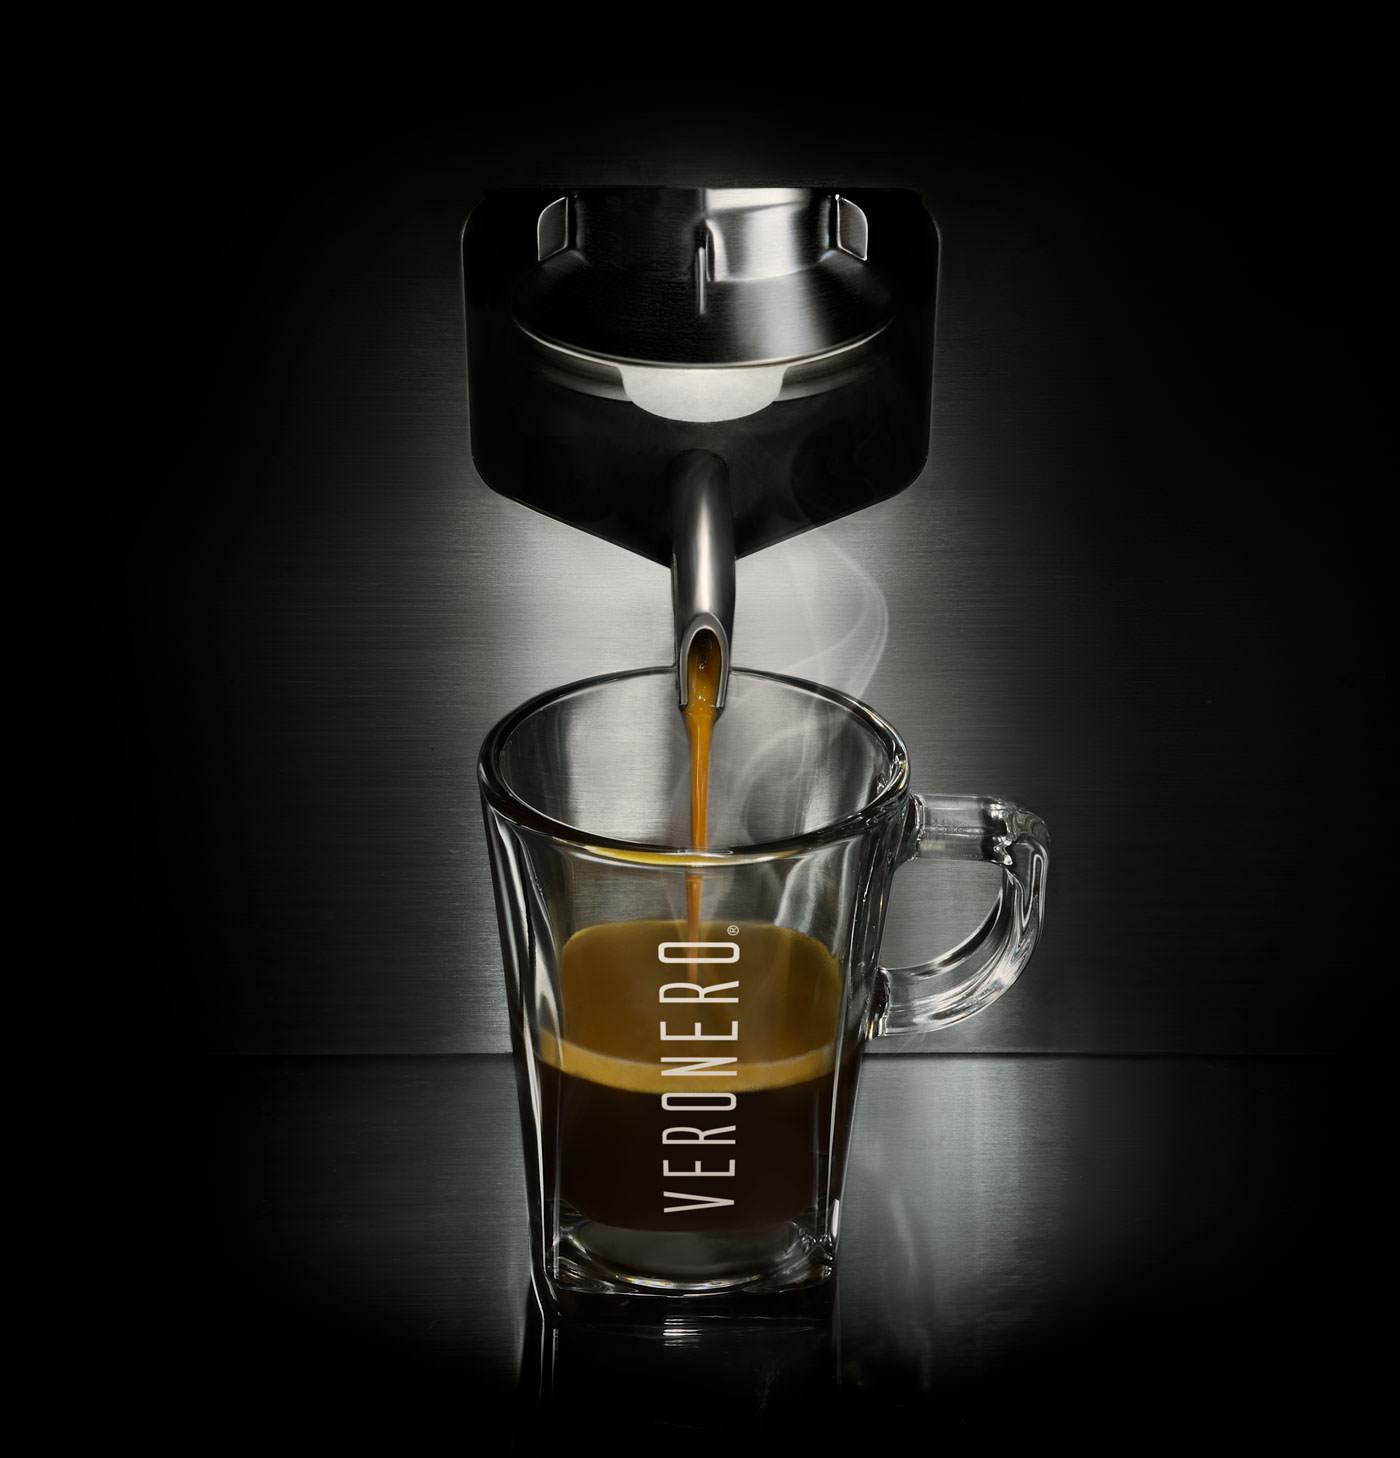 caffè in cialde ese veronero